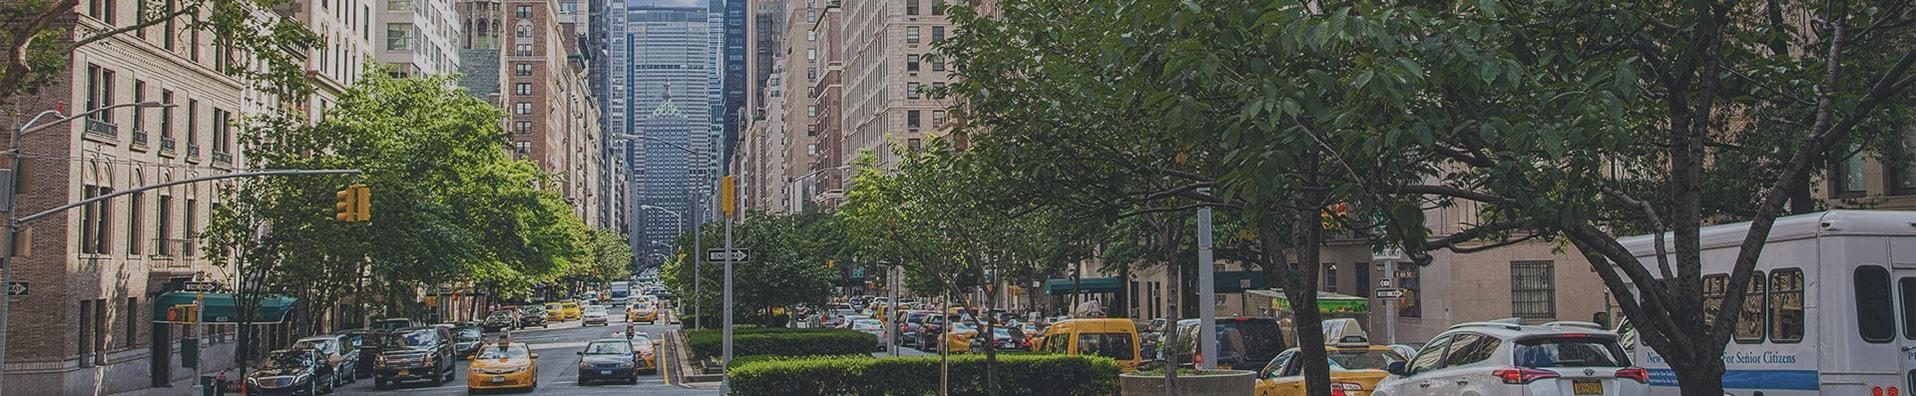 Park Avenue headquarters of Starr Insure